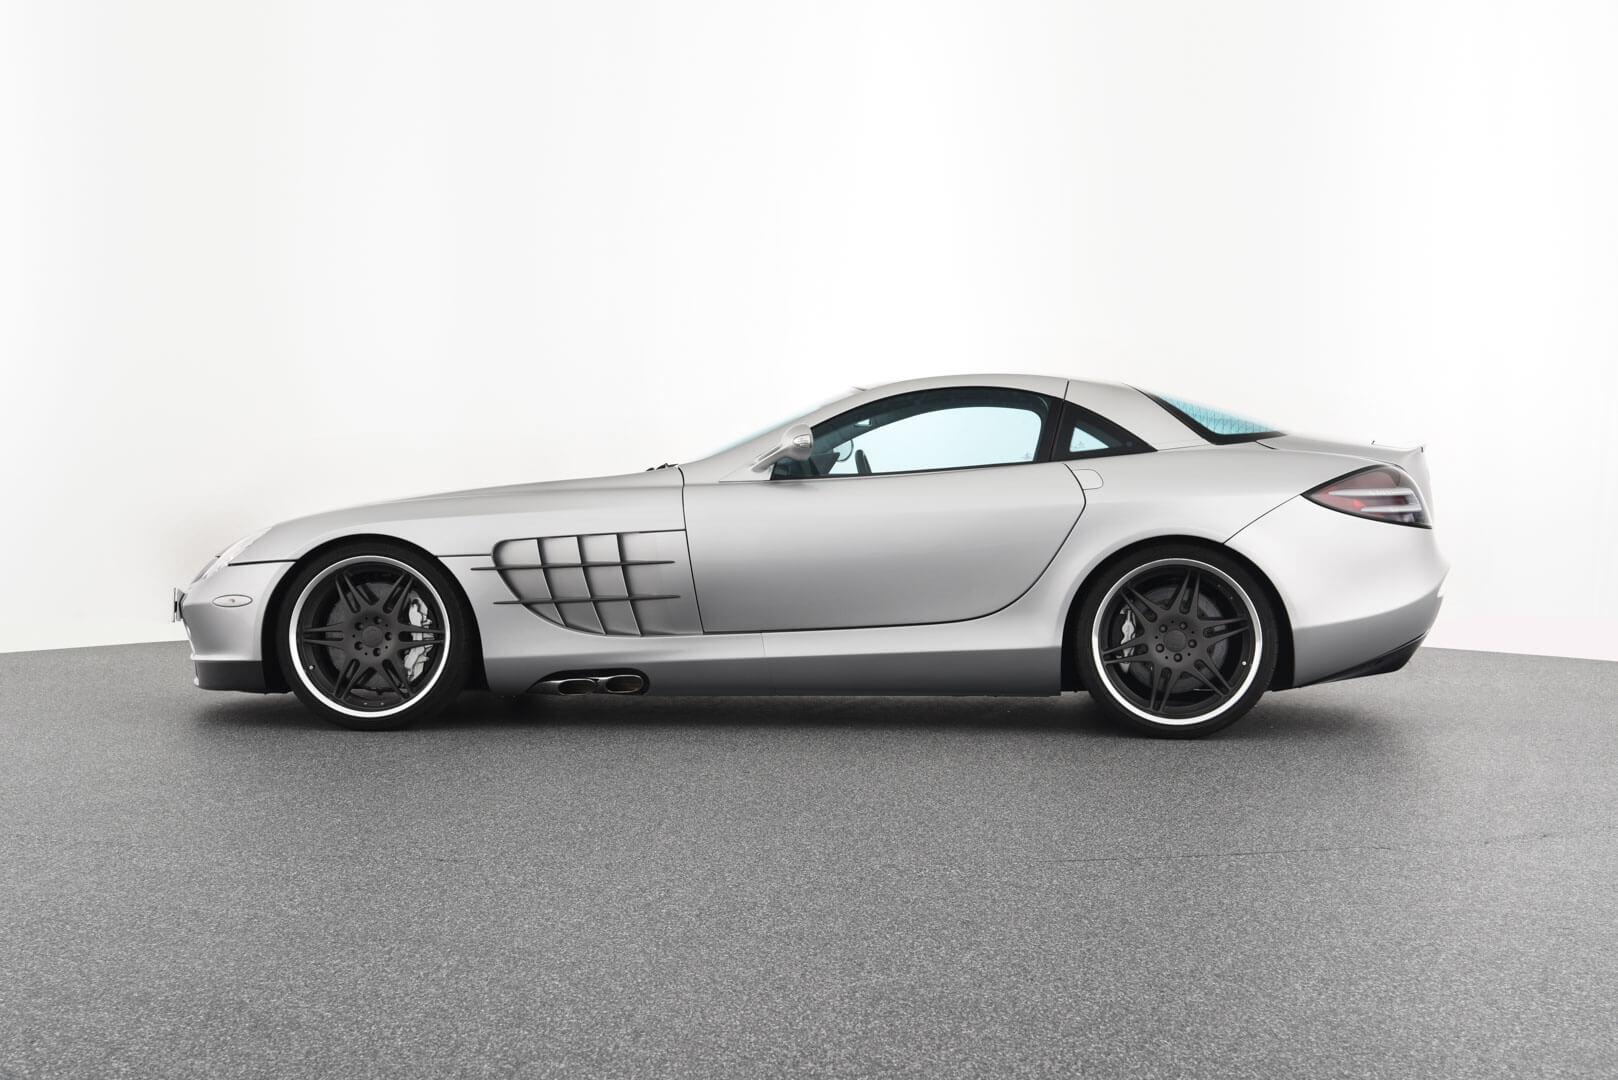 Mercedes-Benz SLR McLaren